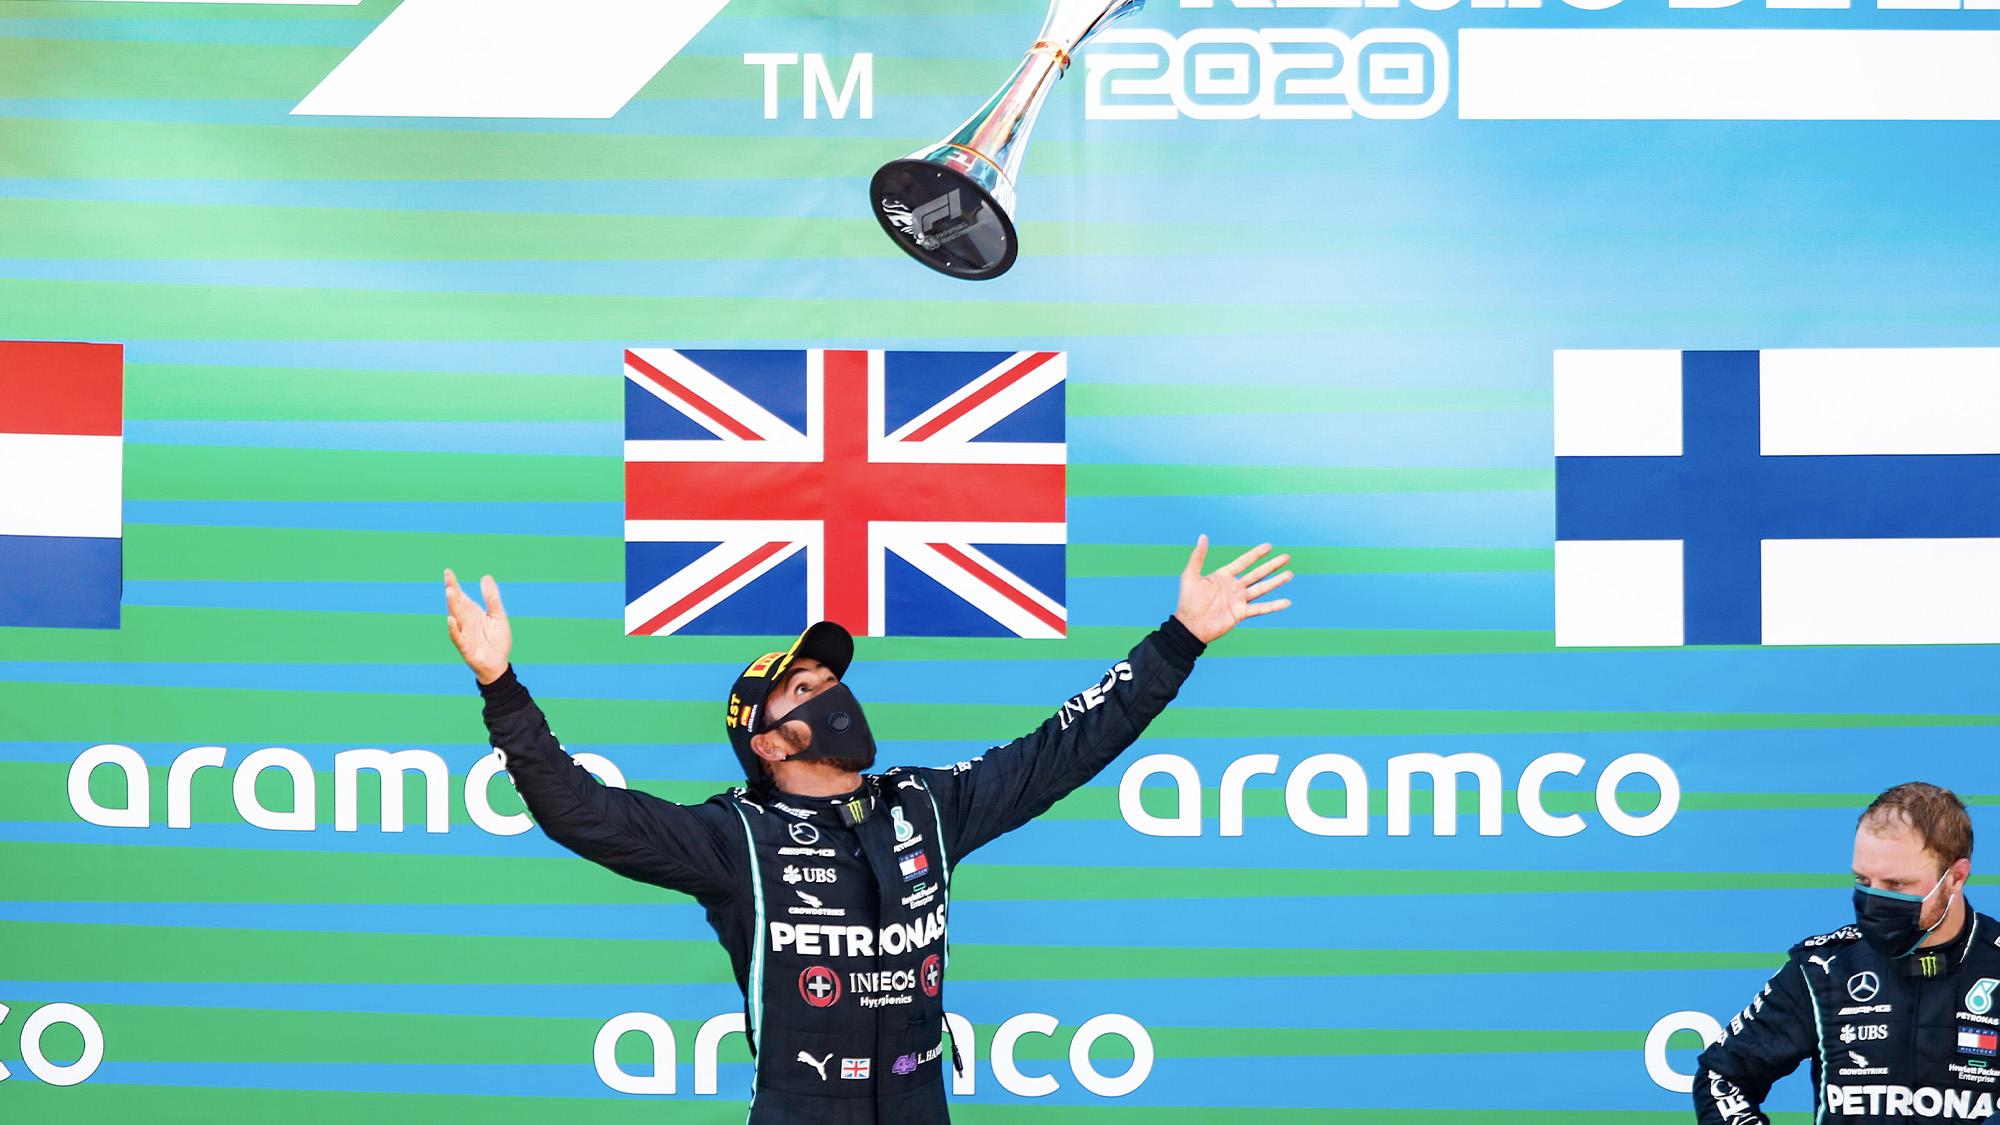 Hamilton throws trophy in the air